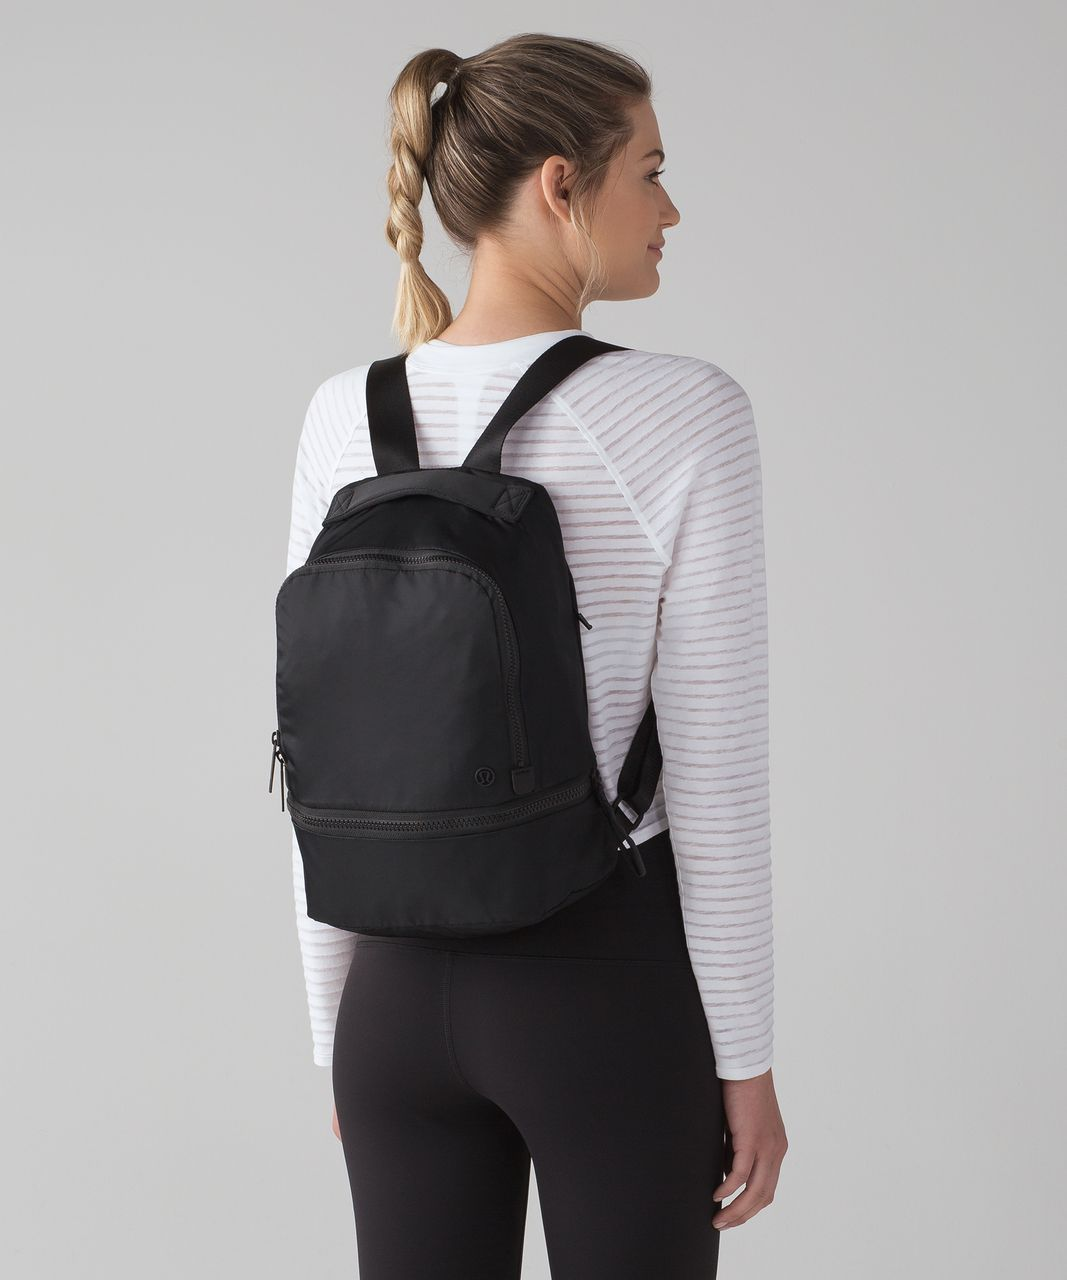 Lululemon Go Lightly Backpack (Mini) - Black - lulu fanatics